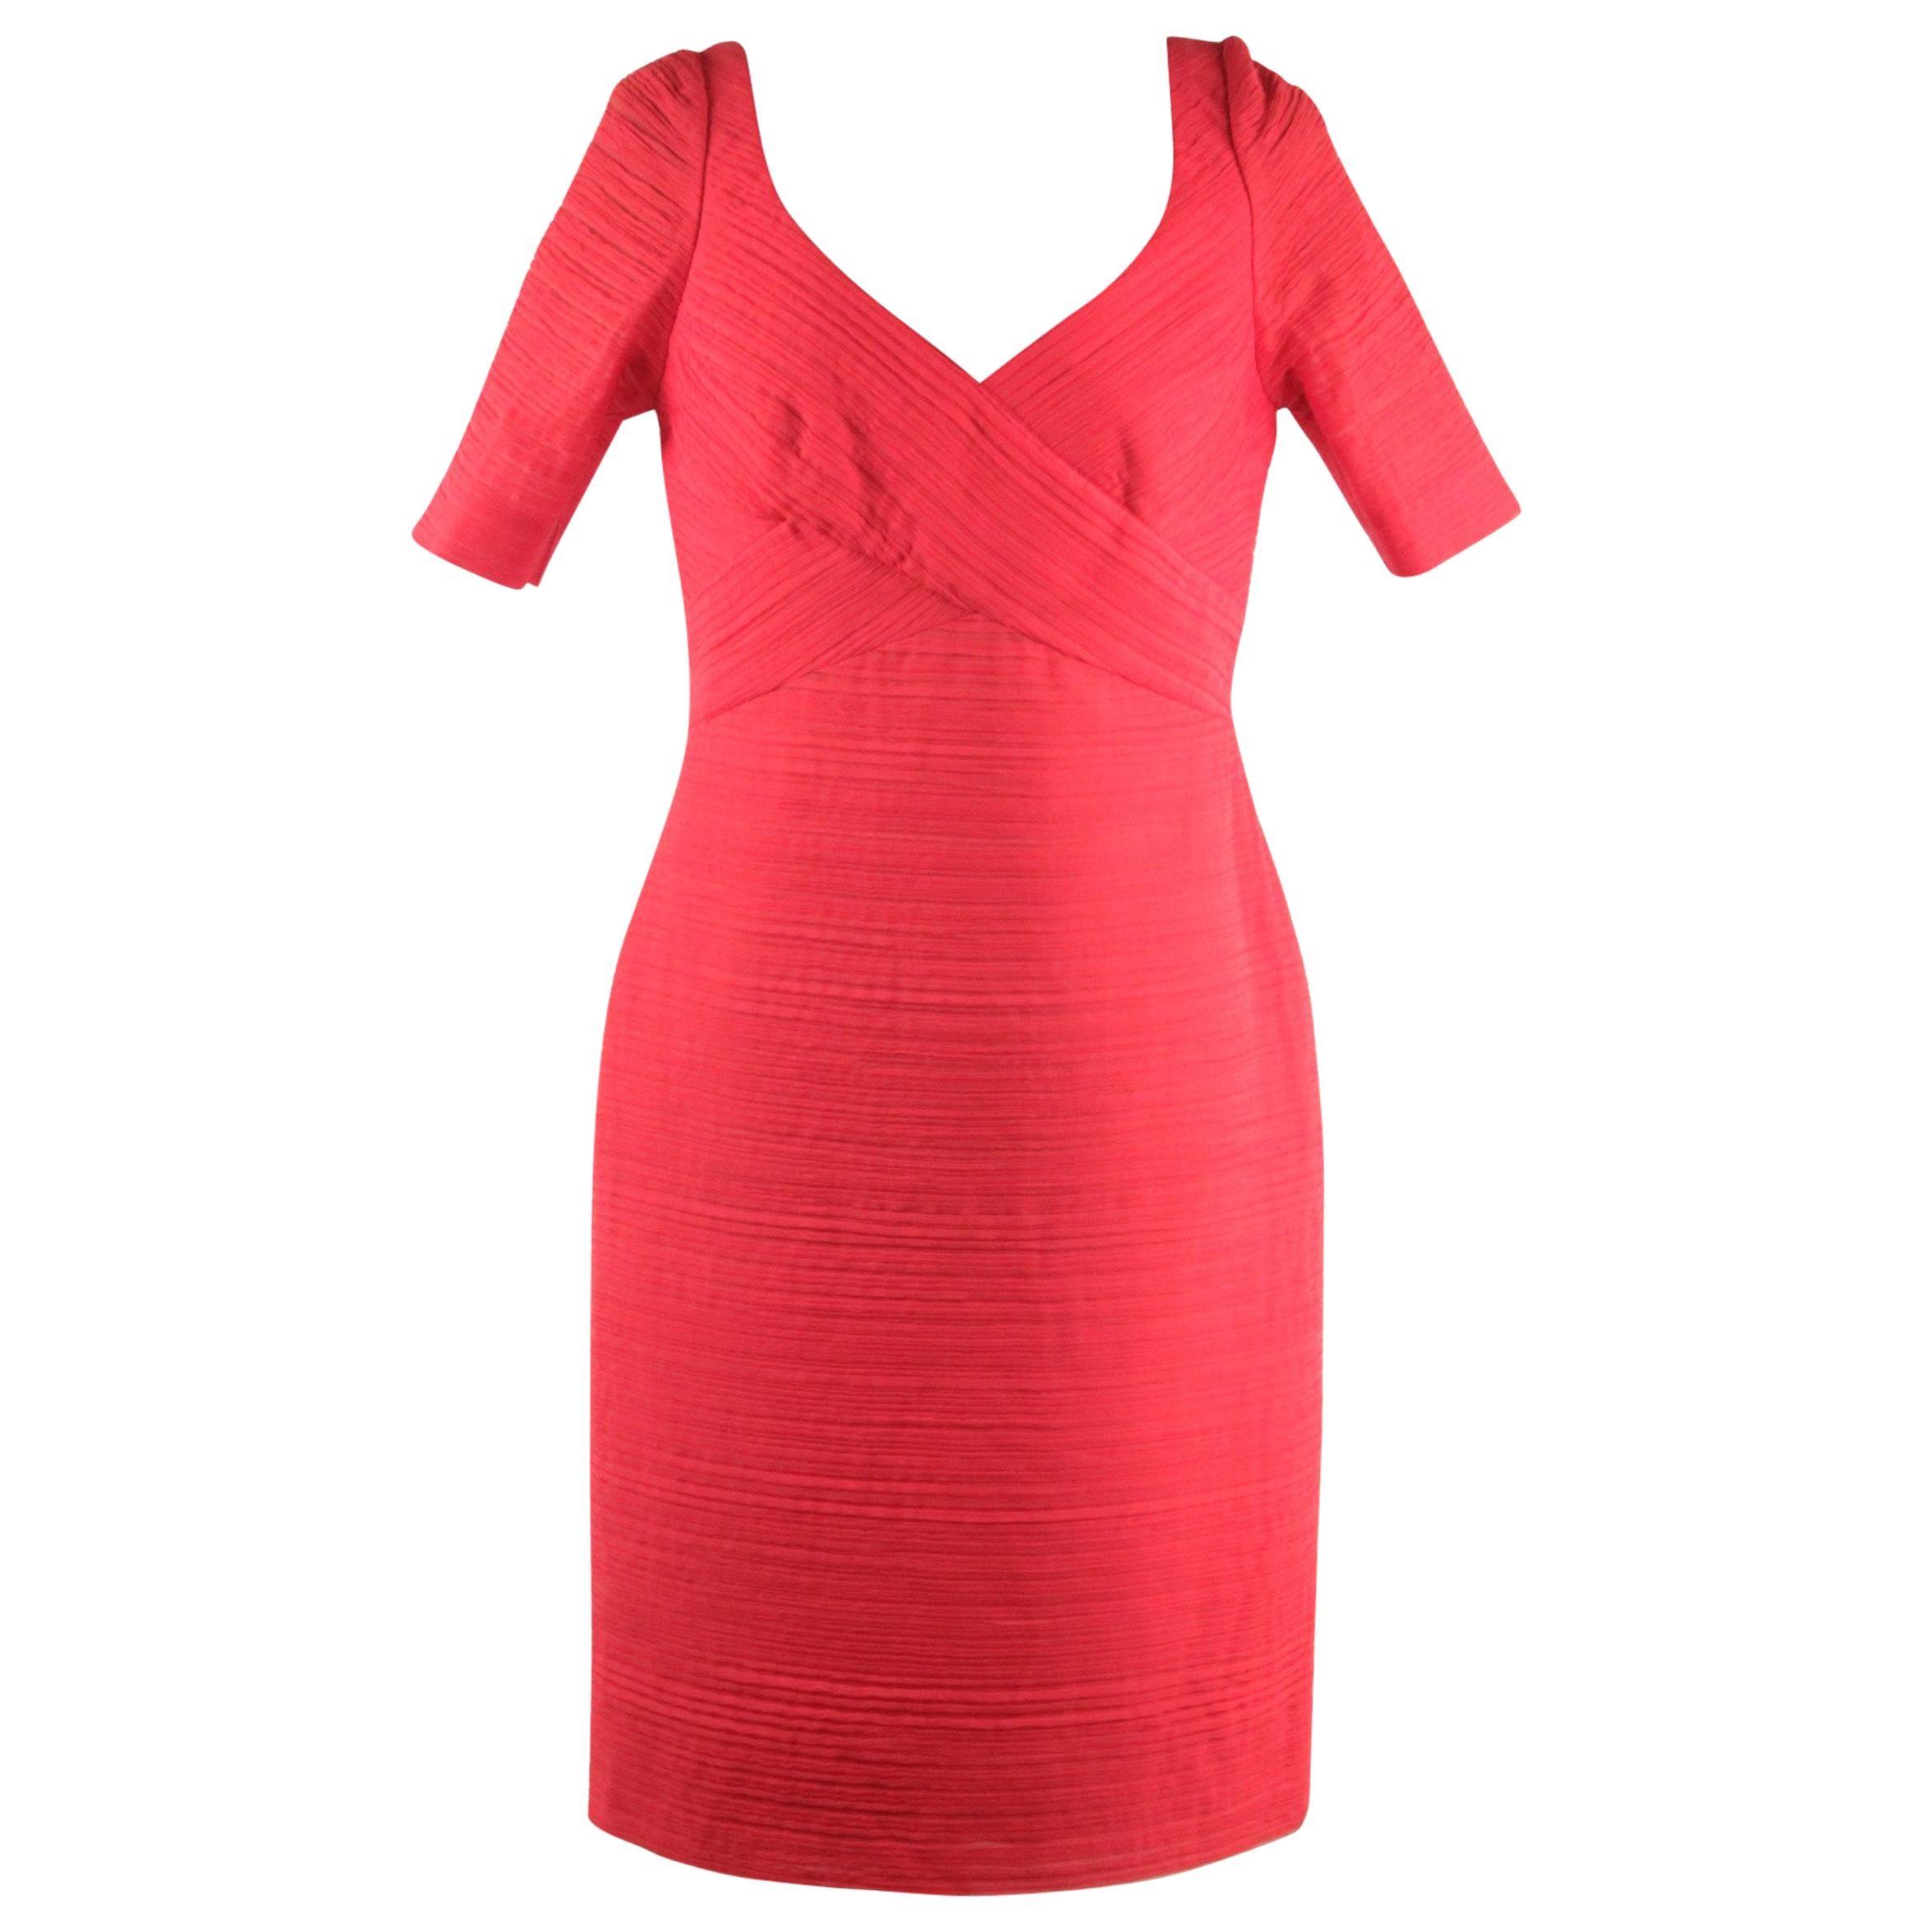 5034a34a364f Opherty & Ciocci Clothing - 1stdibs